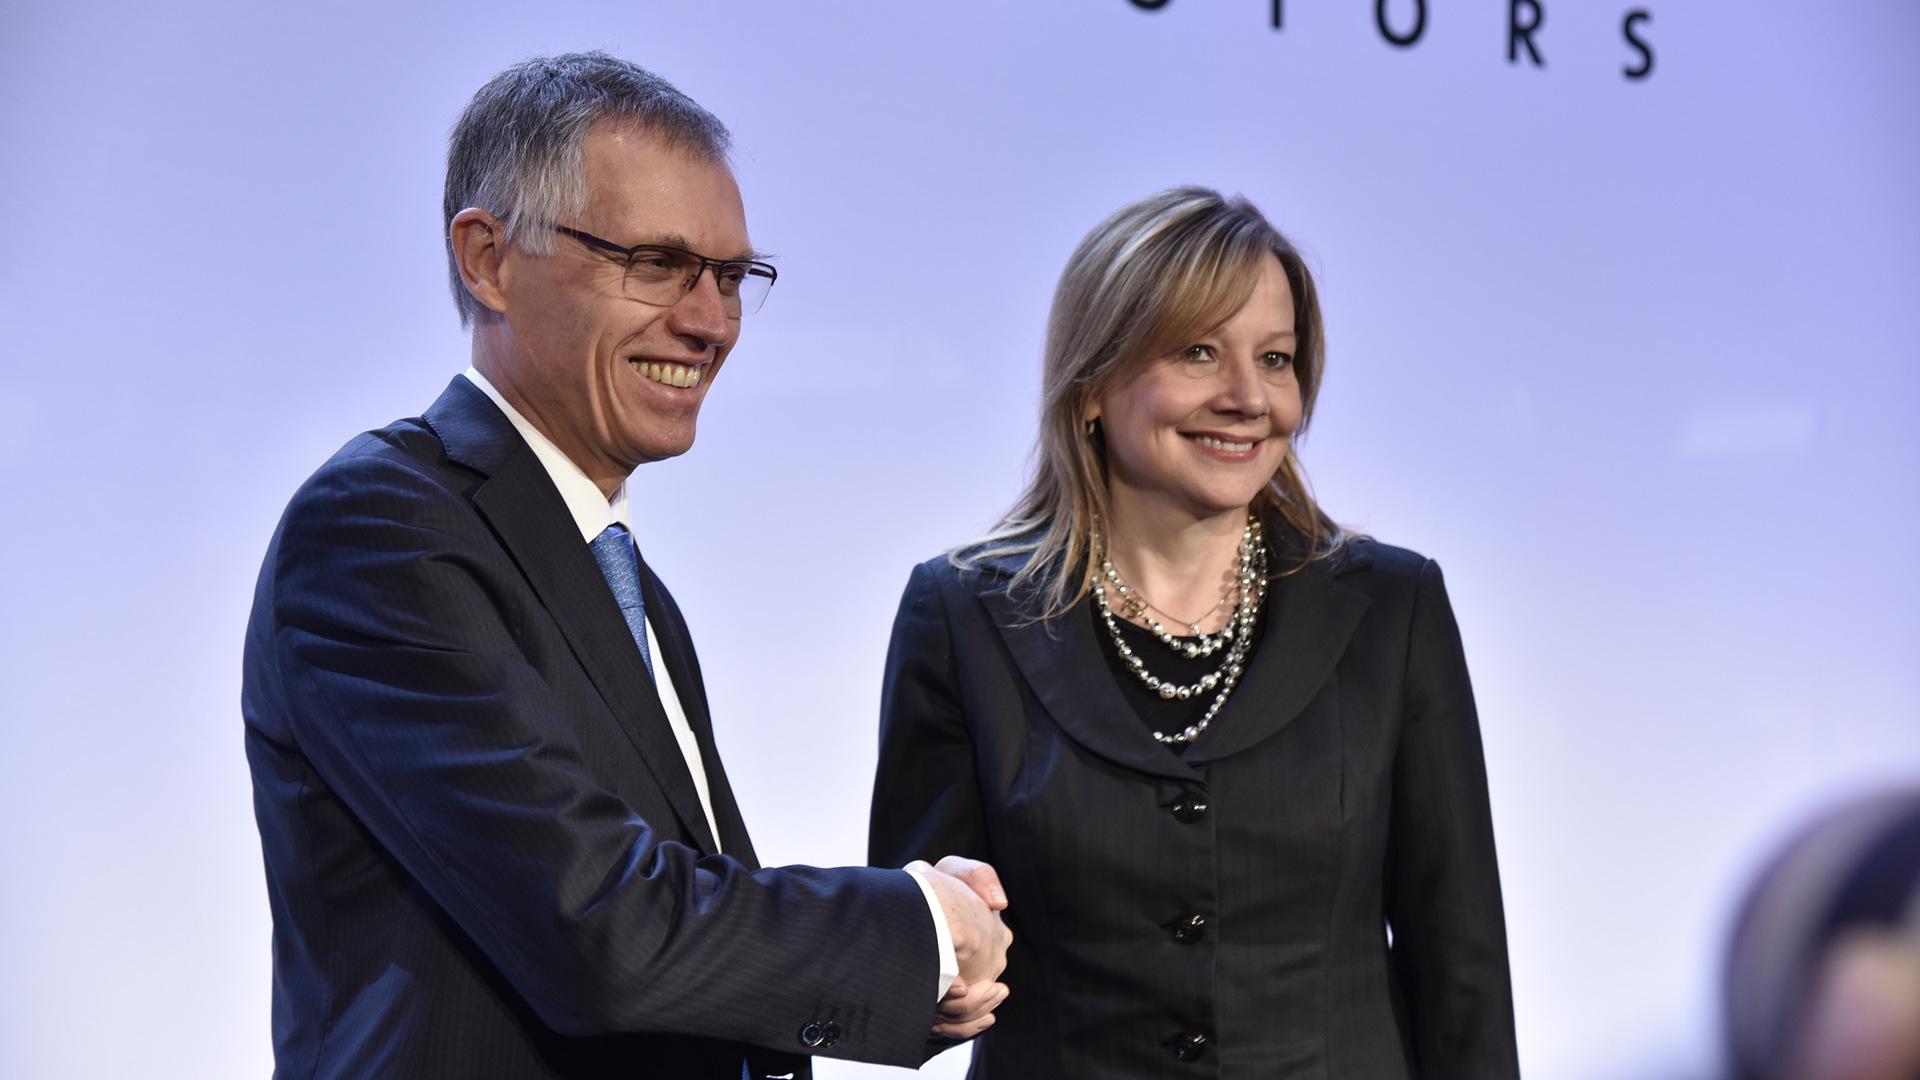 PSA Group CEO Carlos Taveres and GM CEO Mary Barra